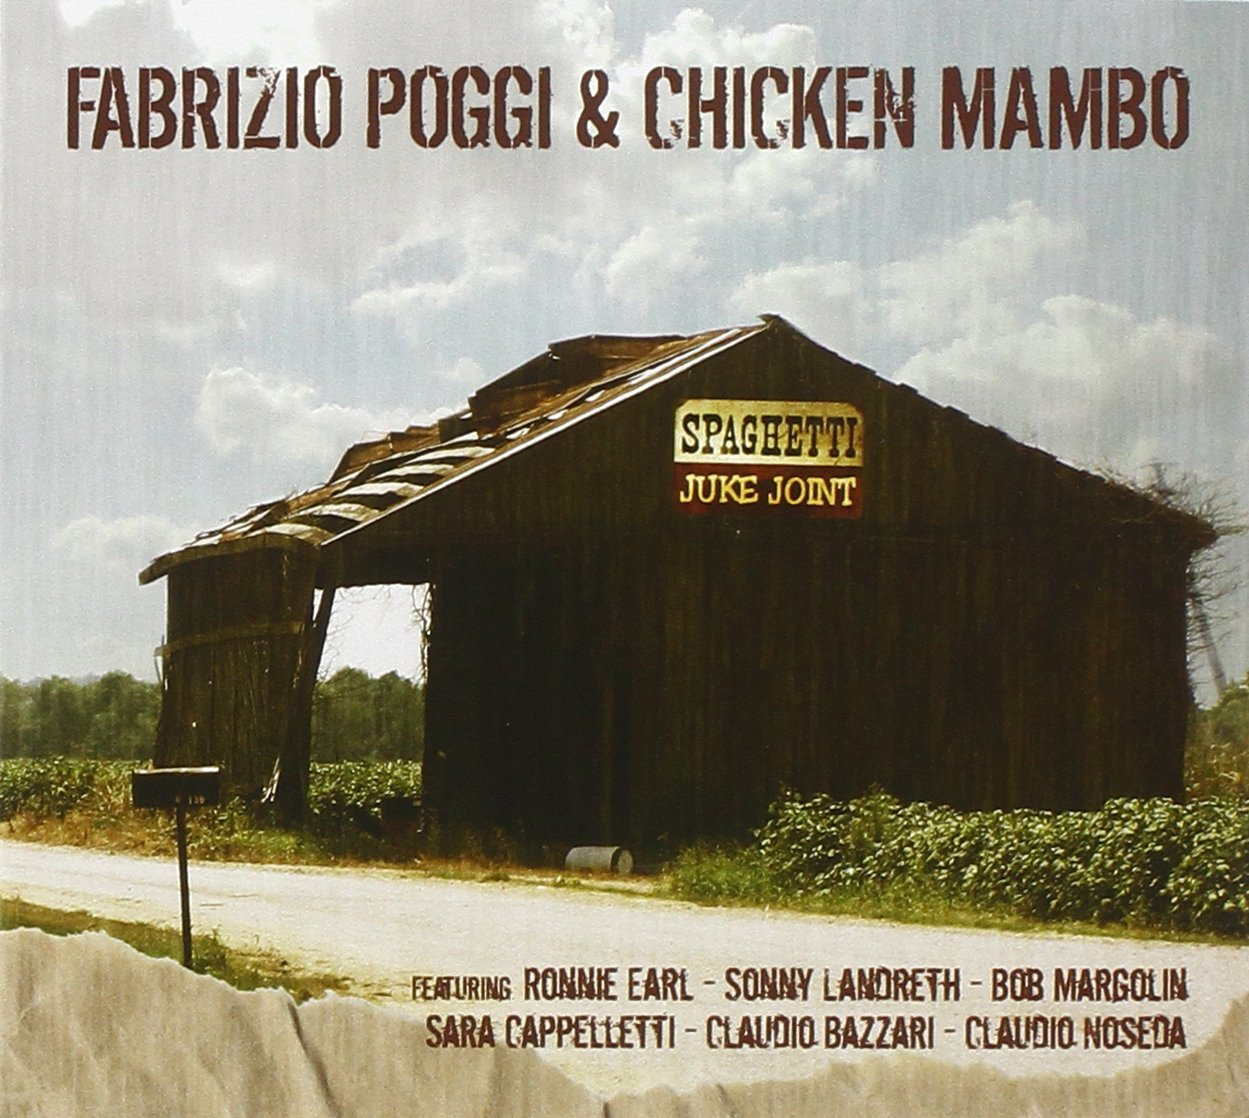 FABRIZIO POGGI & CHICKEN MAMBO Spaghetti Juke Joint